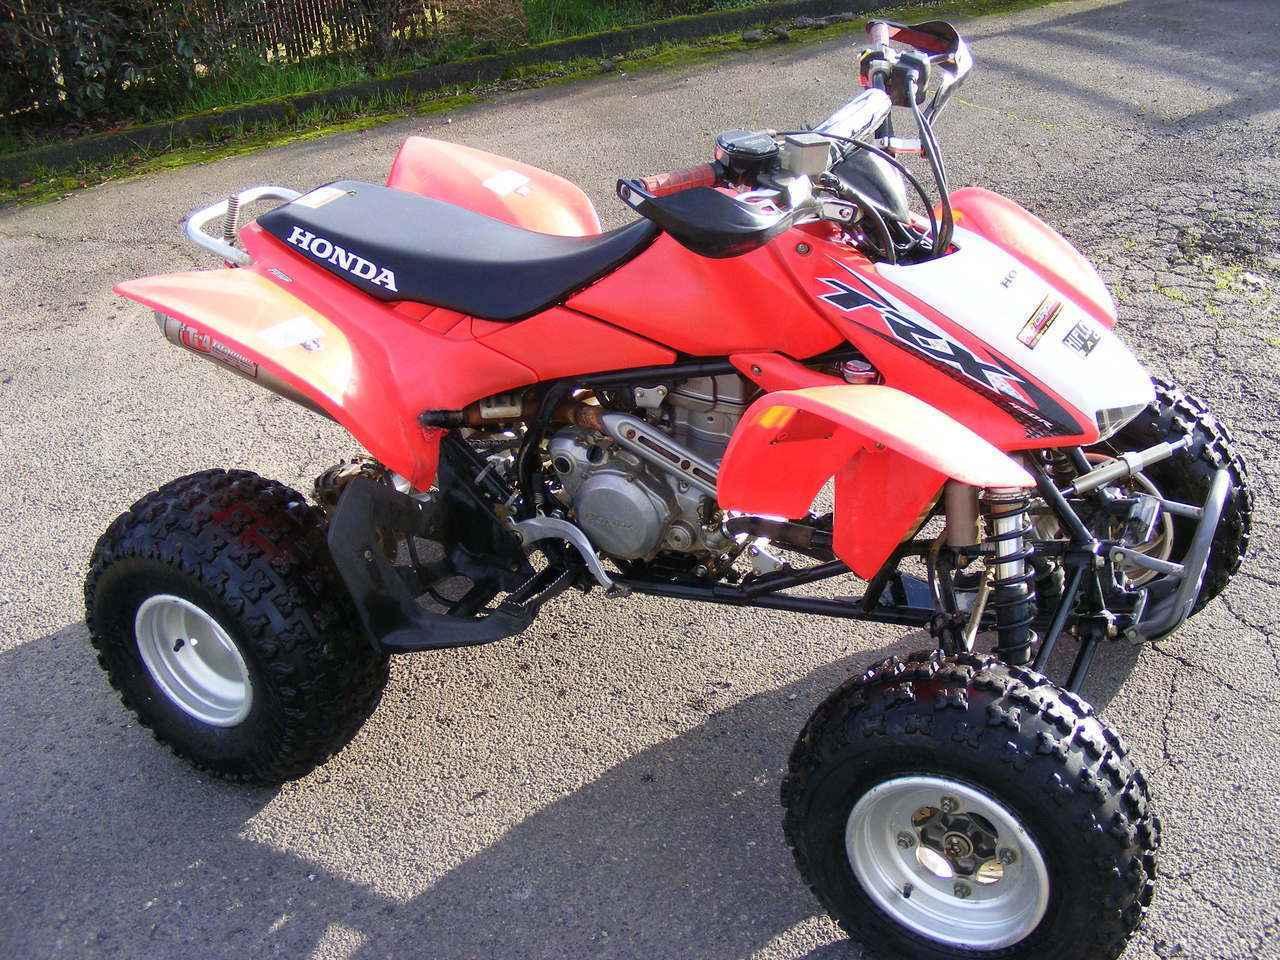 Used 2014 Honda TRX 450R ATVs For Sale in Oregon on atvtrades com